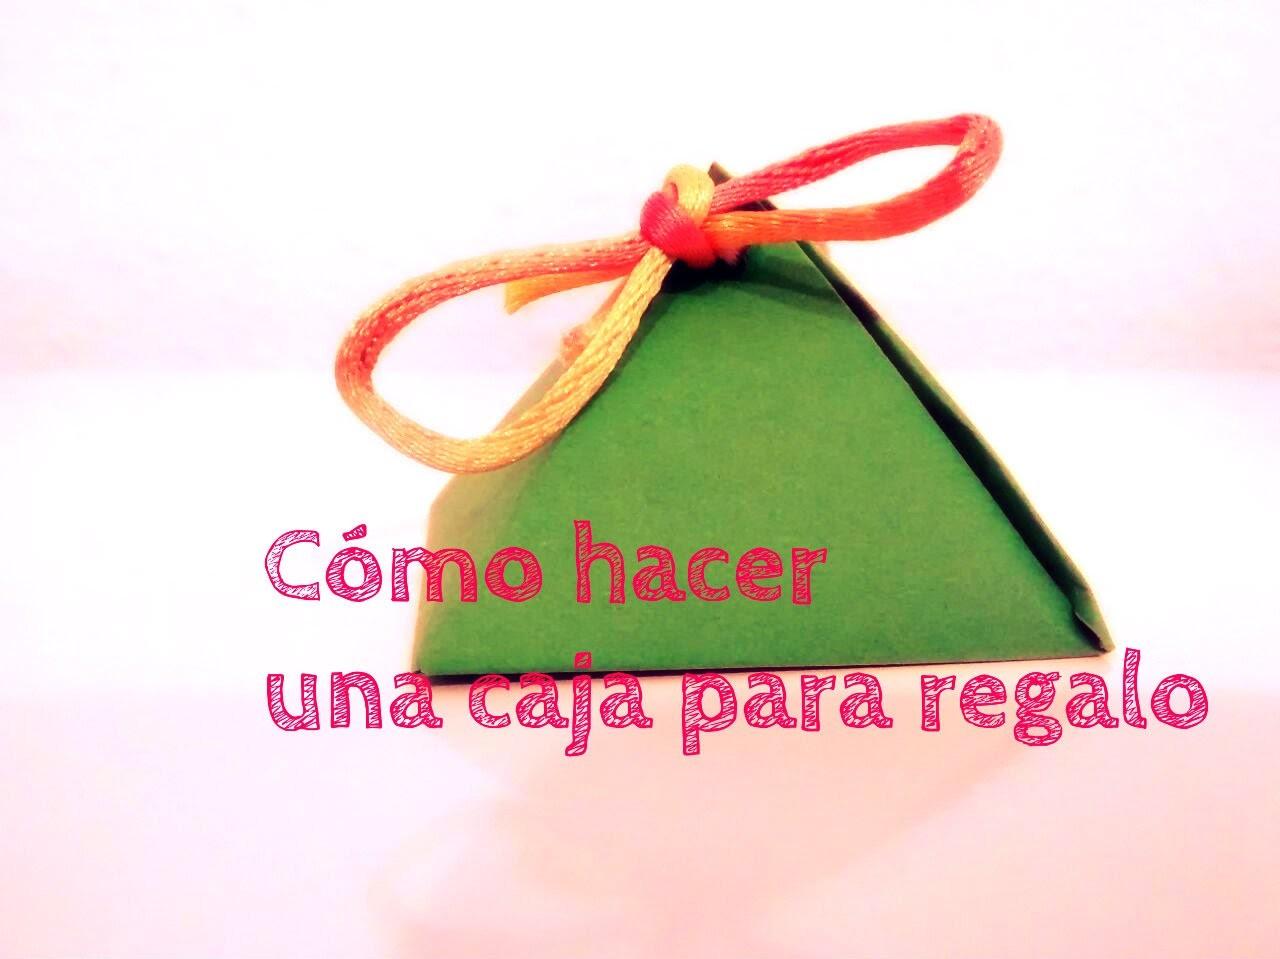 Cómo hacer una cajita para regalo - How to do a mini box for gift - Ahorradoras.com